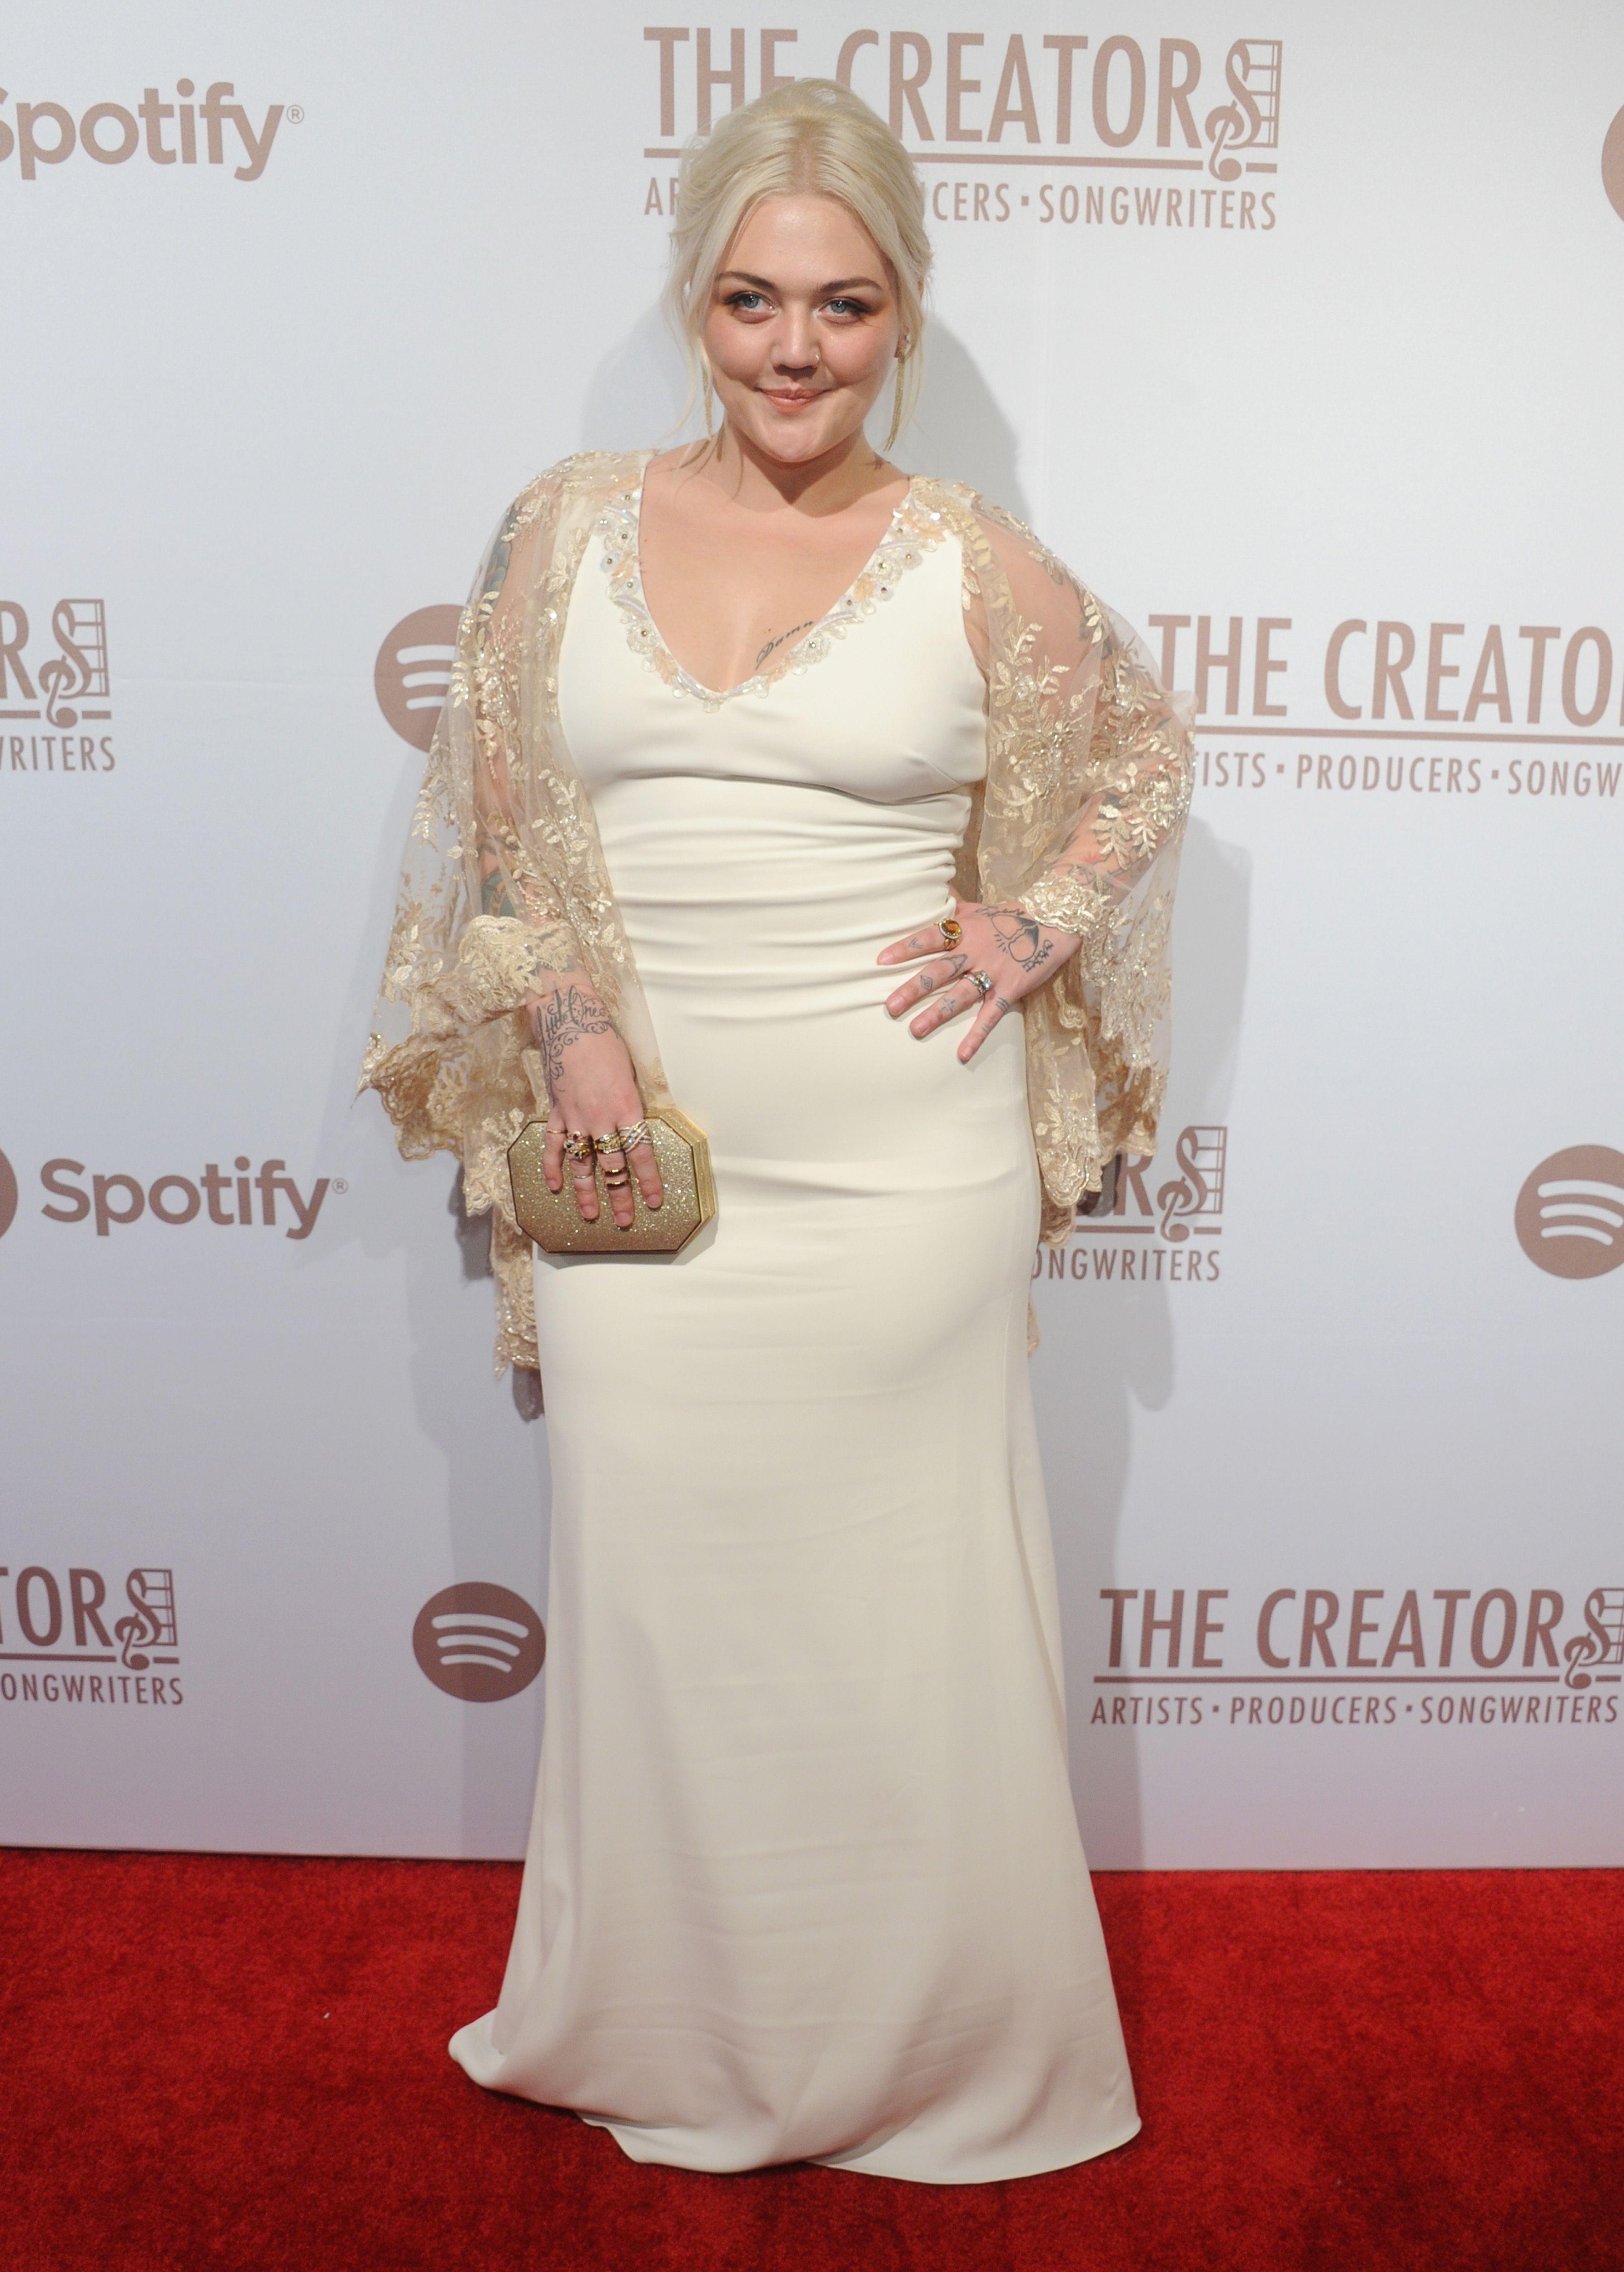 Elle King Wedding Dress : wedding, dress, Looks, Perry's, Spotify, Creators, Party, Fashion,, Curvy